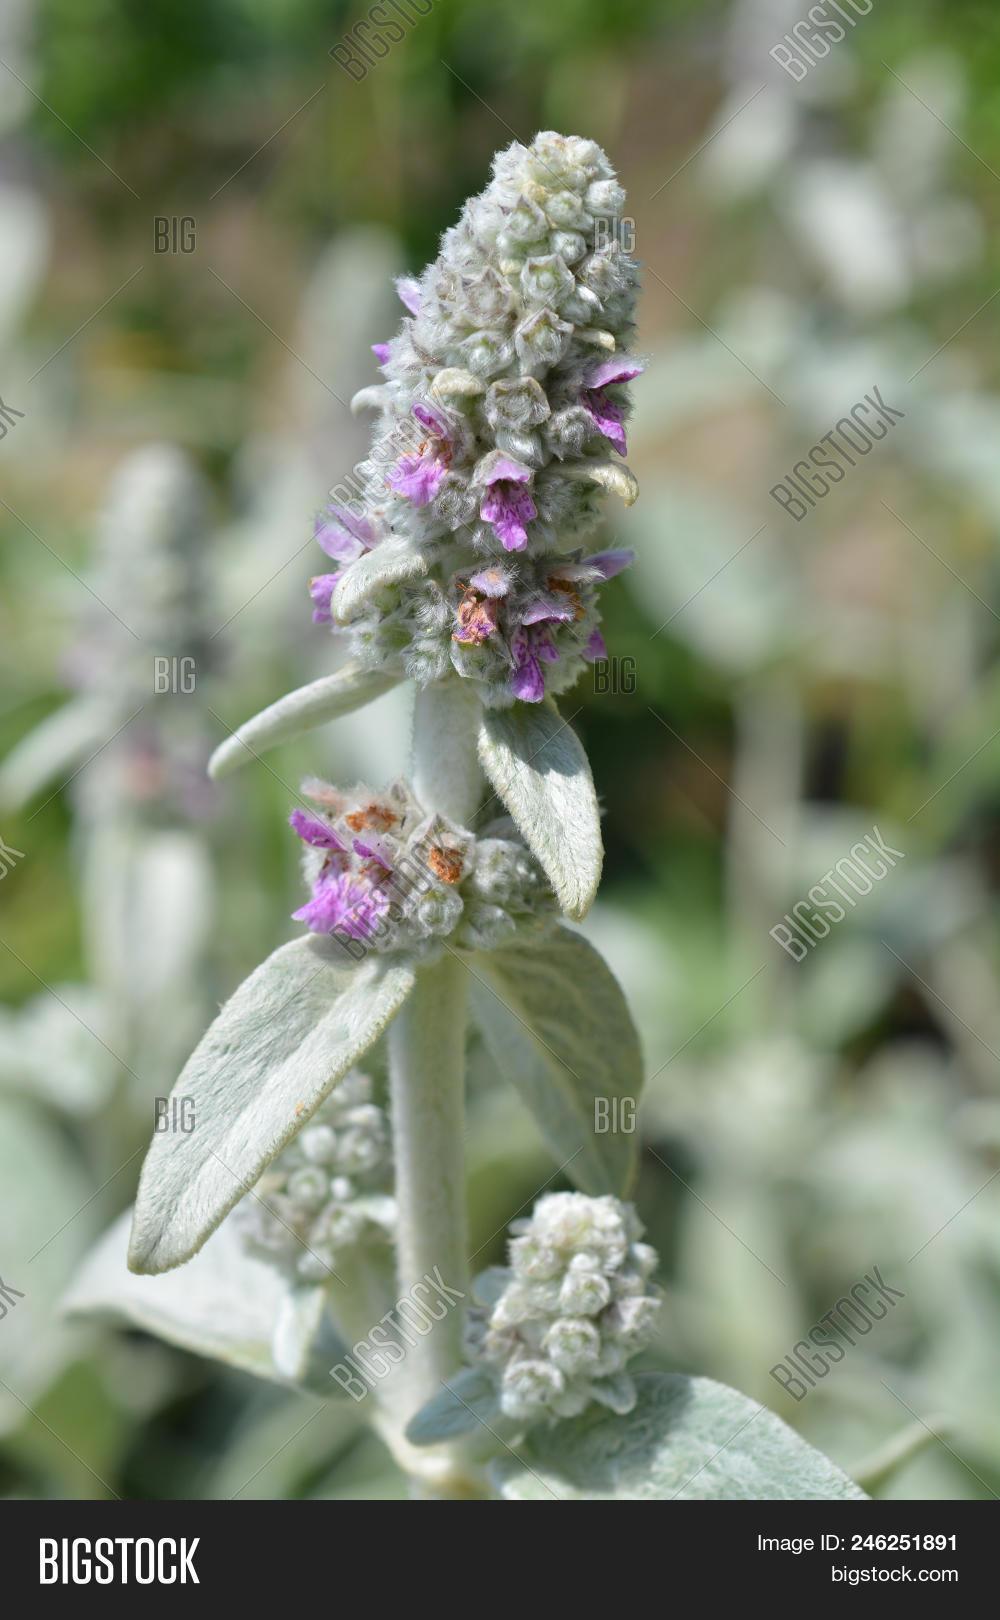 Silver Carpet Lambs Ears Flower - Latin Name - Stachys Byzantina Silver Carpet